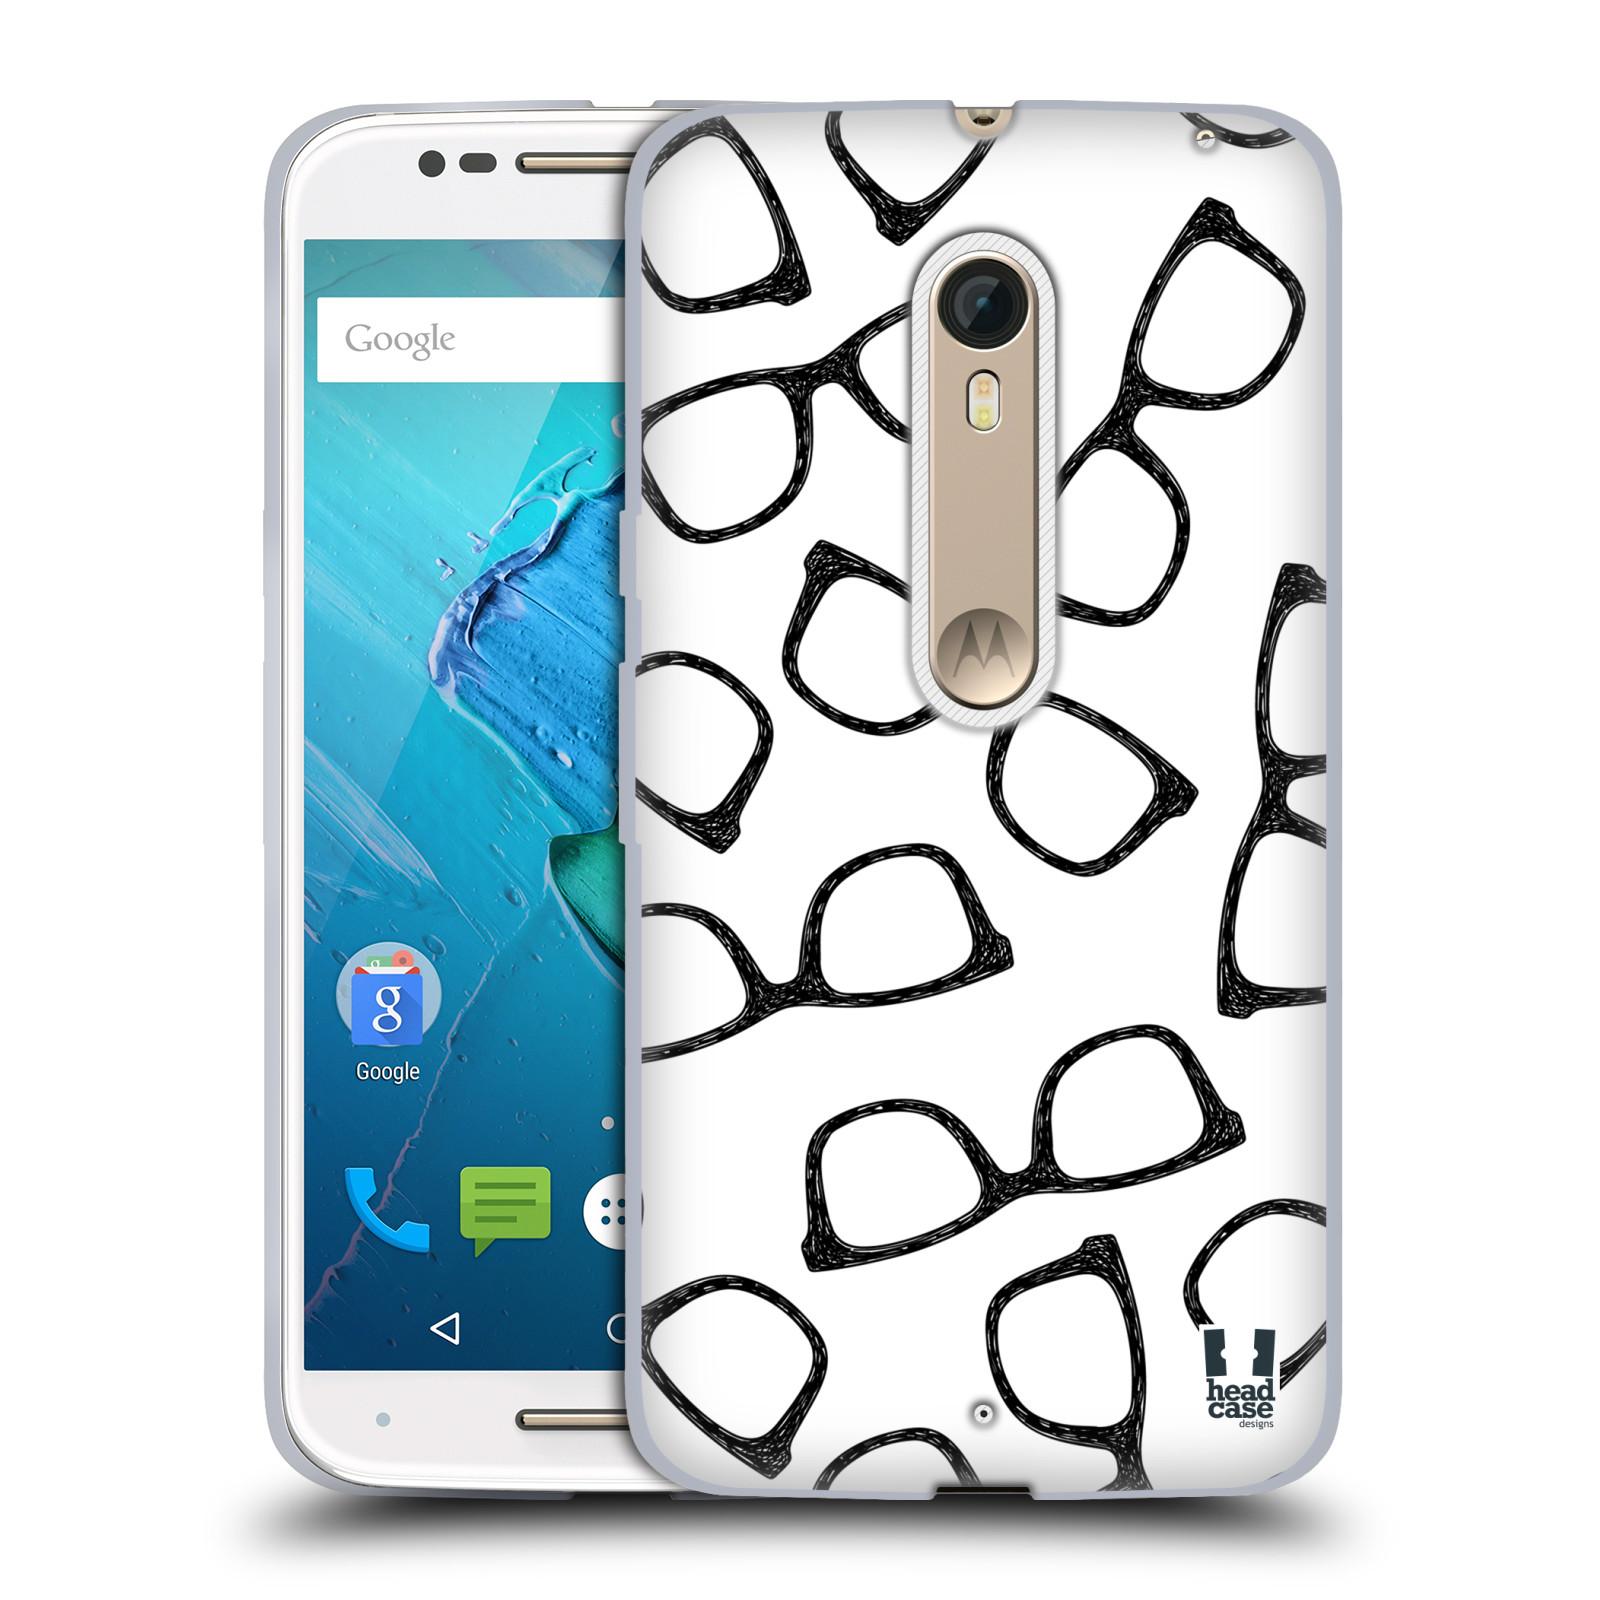 Silikonové pouzdro na mobil Motorola Moto X Style HEAD CASE HIPSTER BRÝLE (Silikonový kryt či obal na mobilní telefon Motorola Moto X Style)